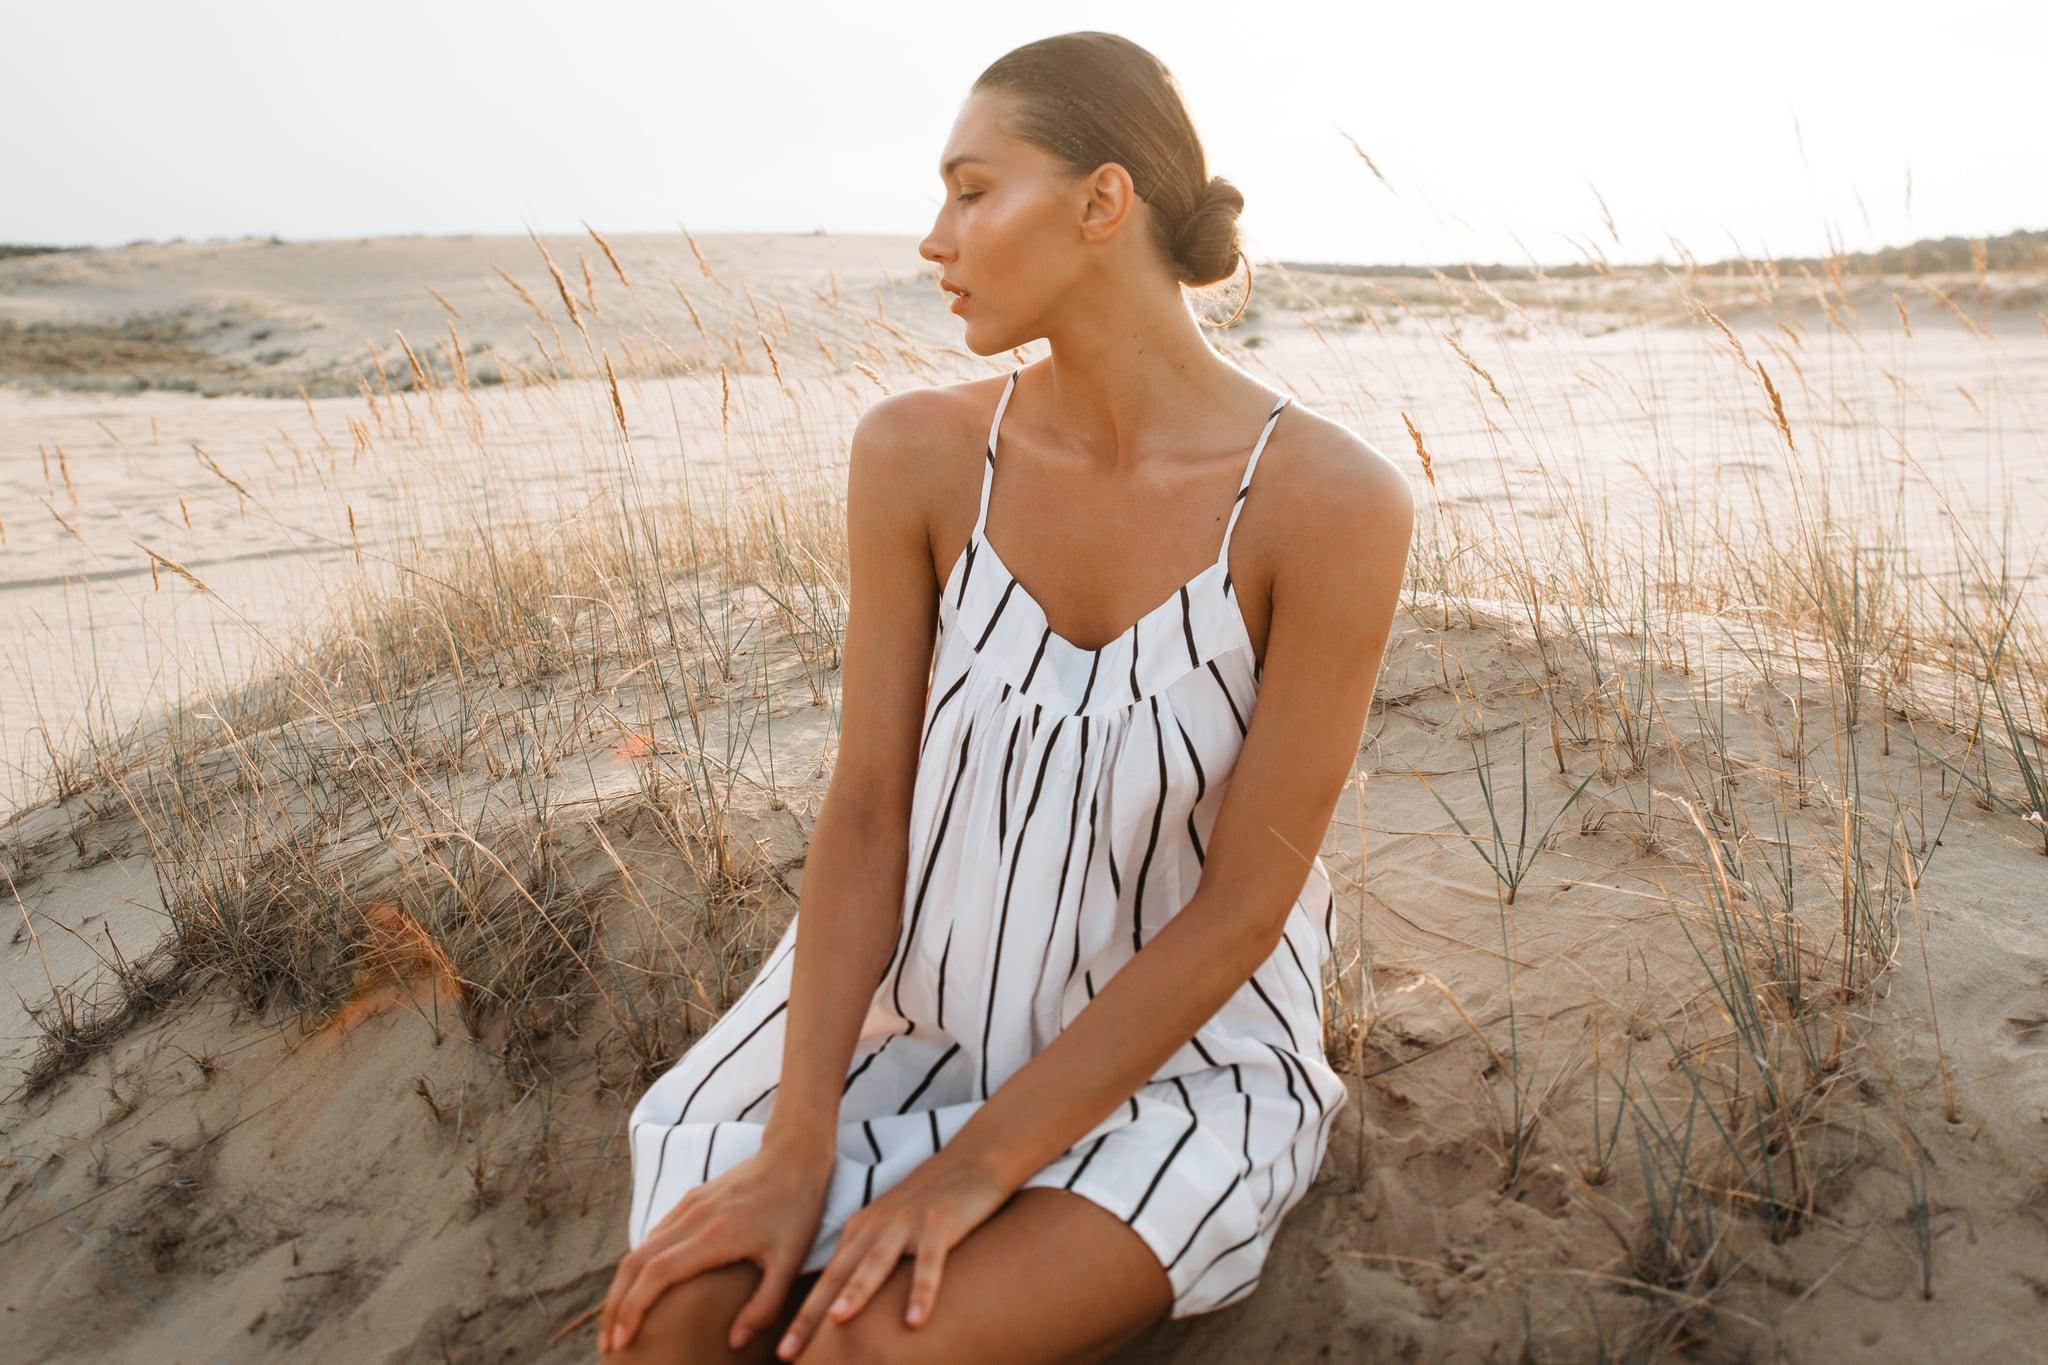 Girl in a striped dress in the evening desert. Model fashion in white dress on sand.; Shutterstock ID 1245789838; Job: -